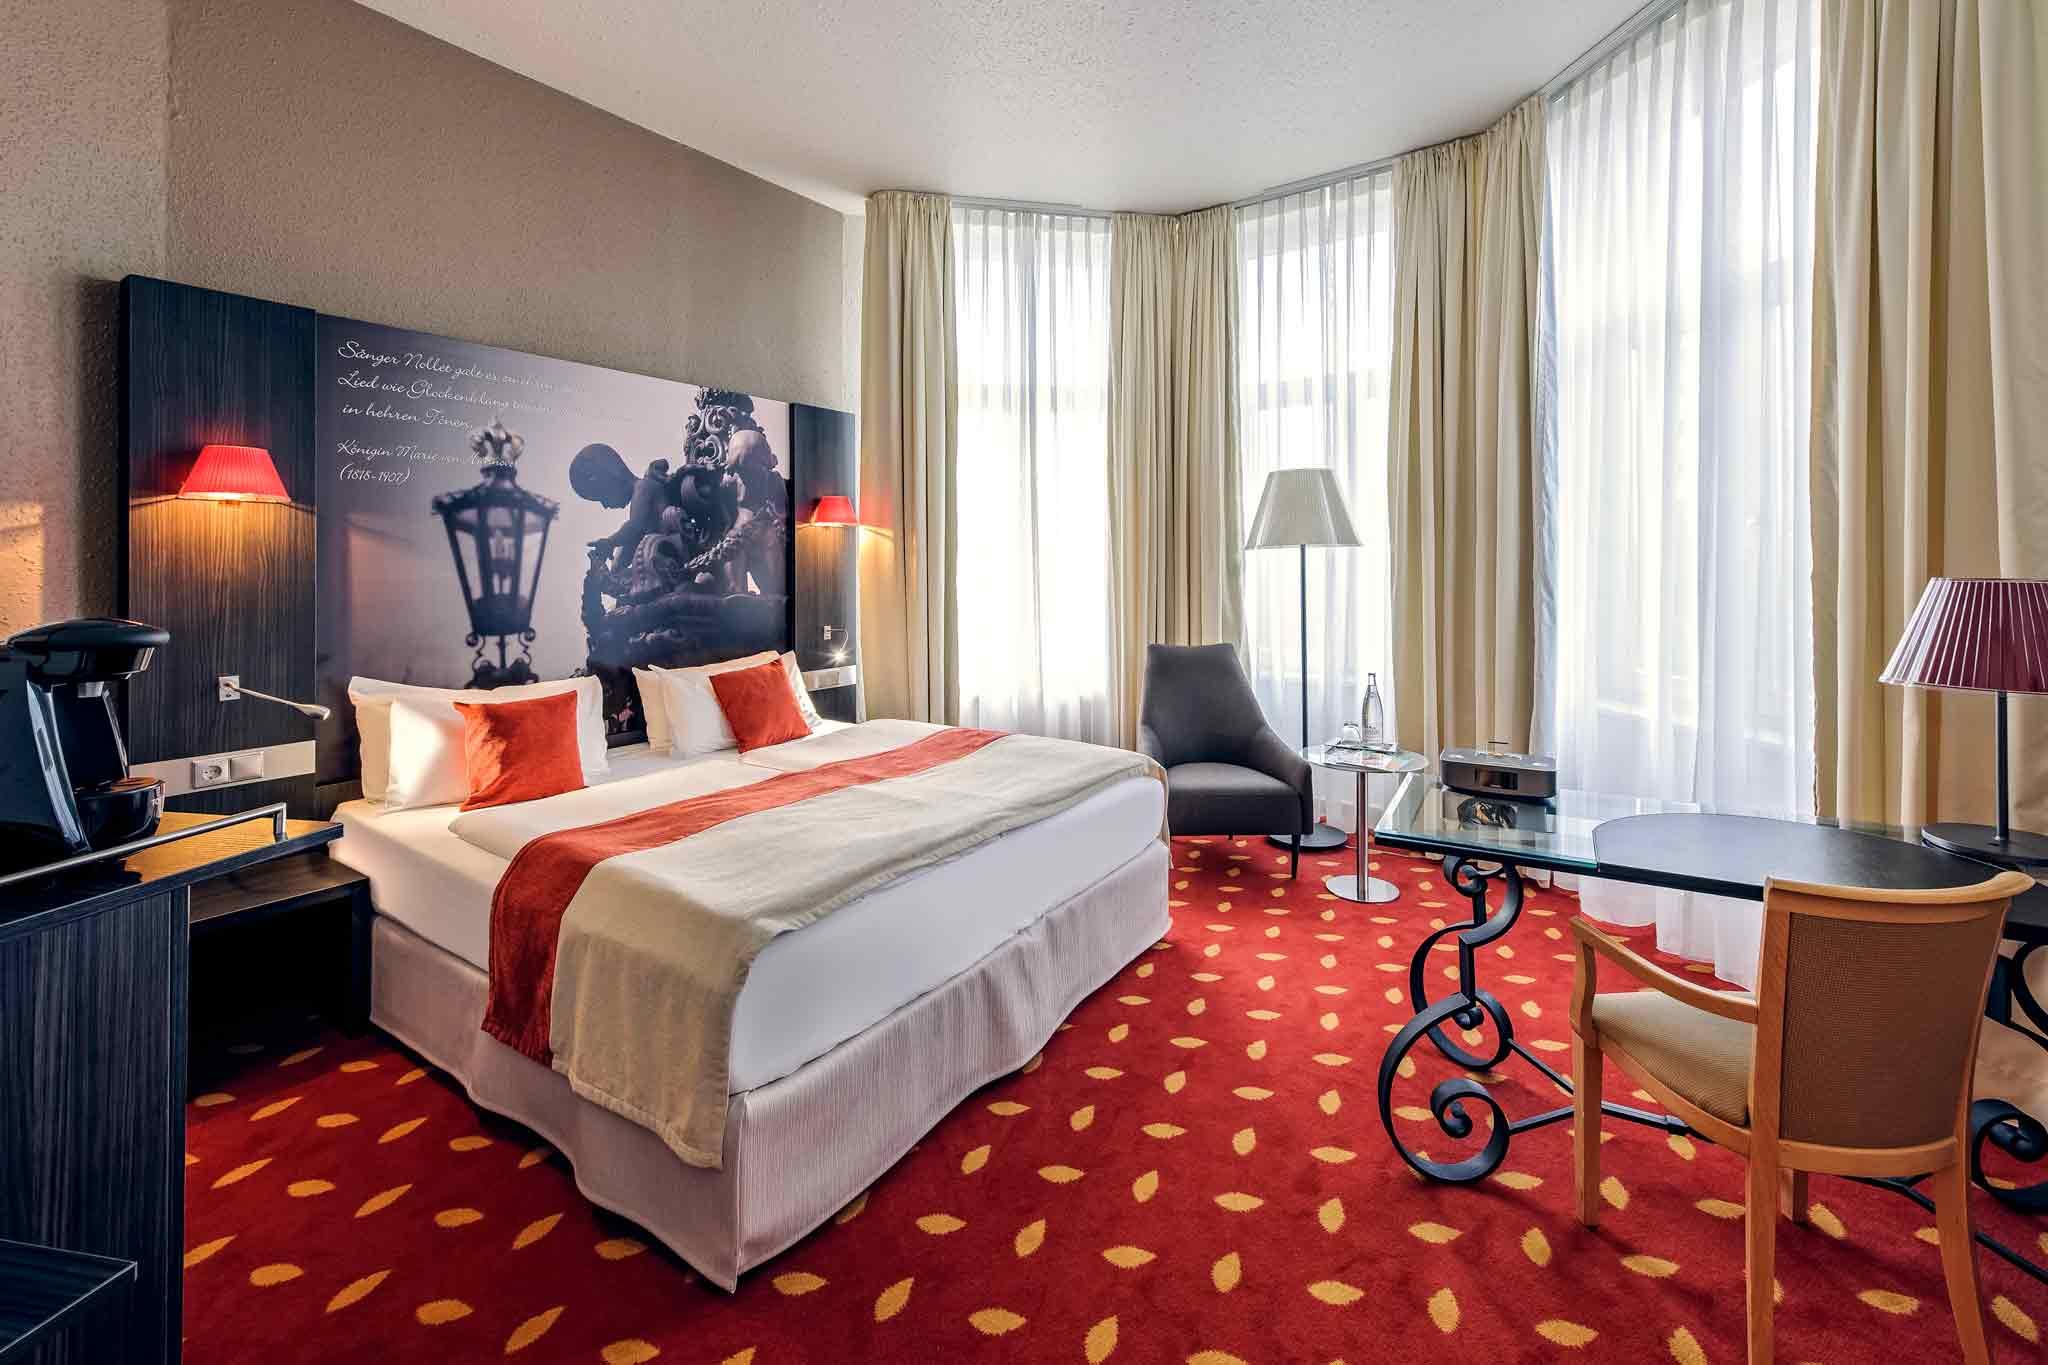 Mercure Hotel Hannover City Szobakilátás